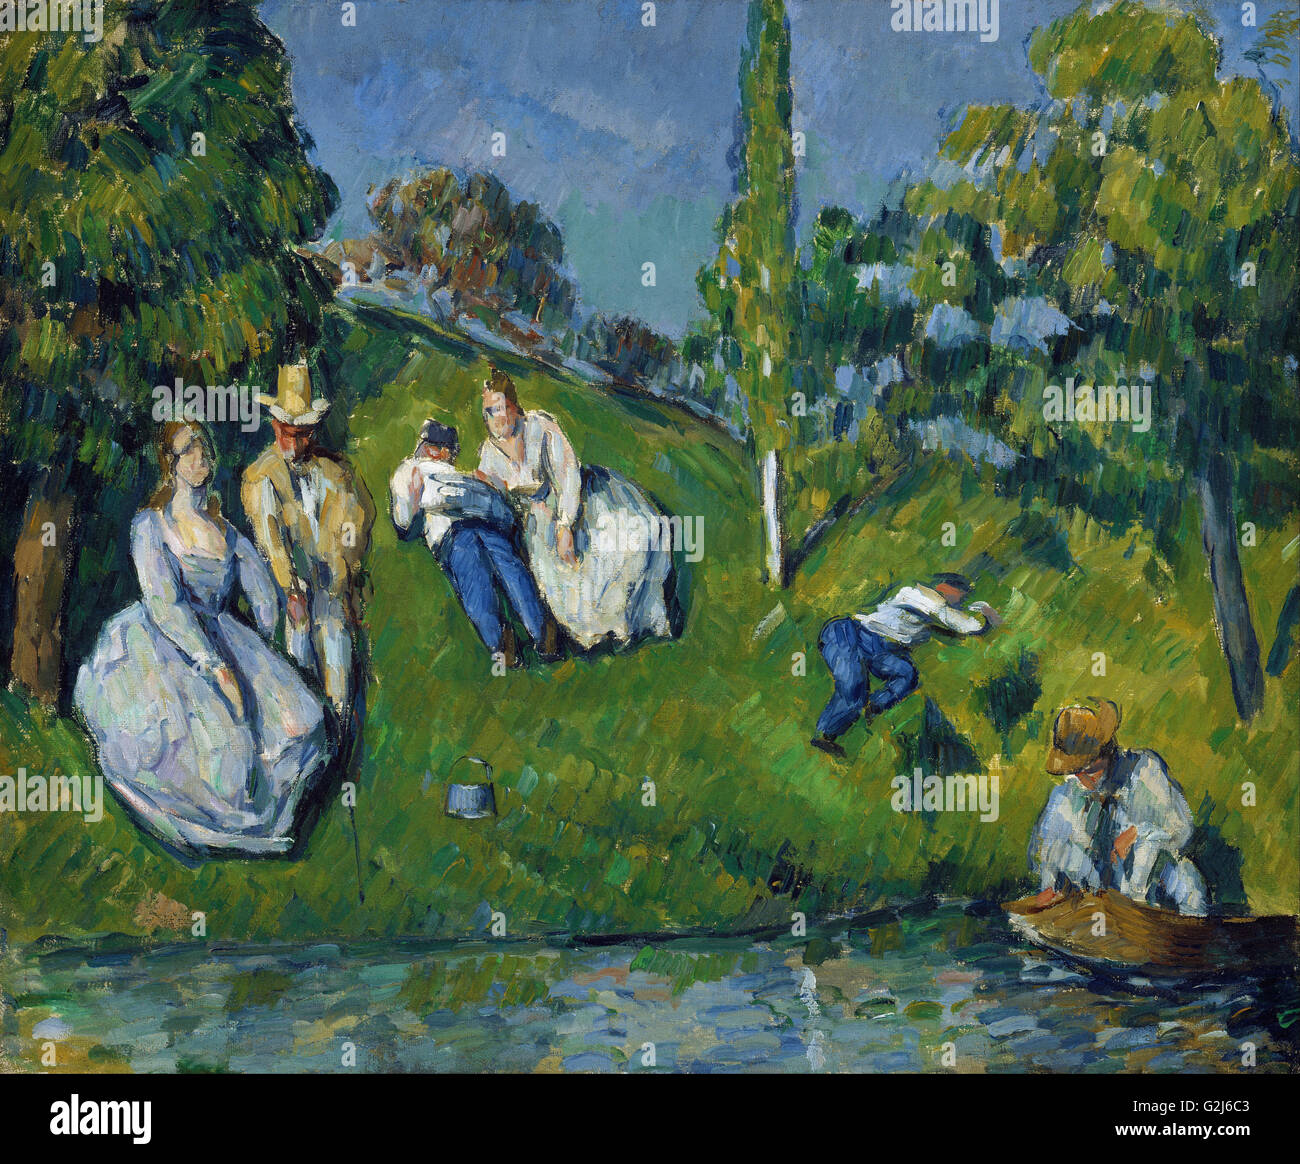 Paul Cézanne - Teich - Museum of Fine Arts, Boston Stockbild